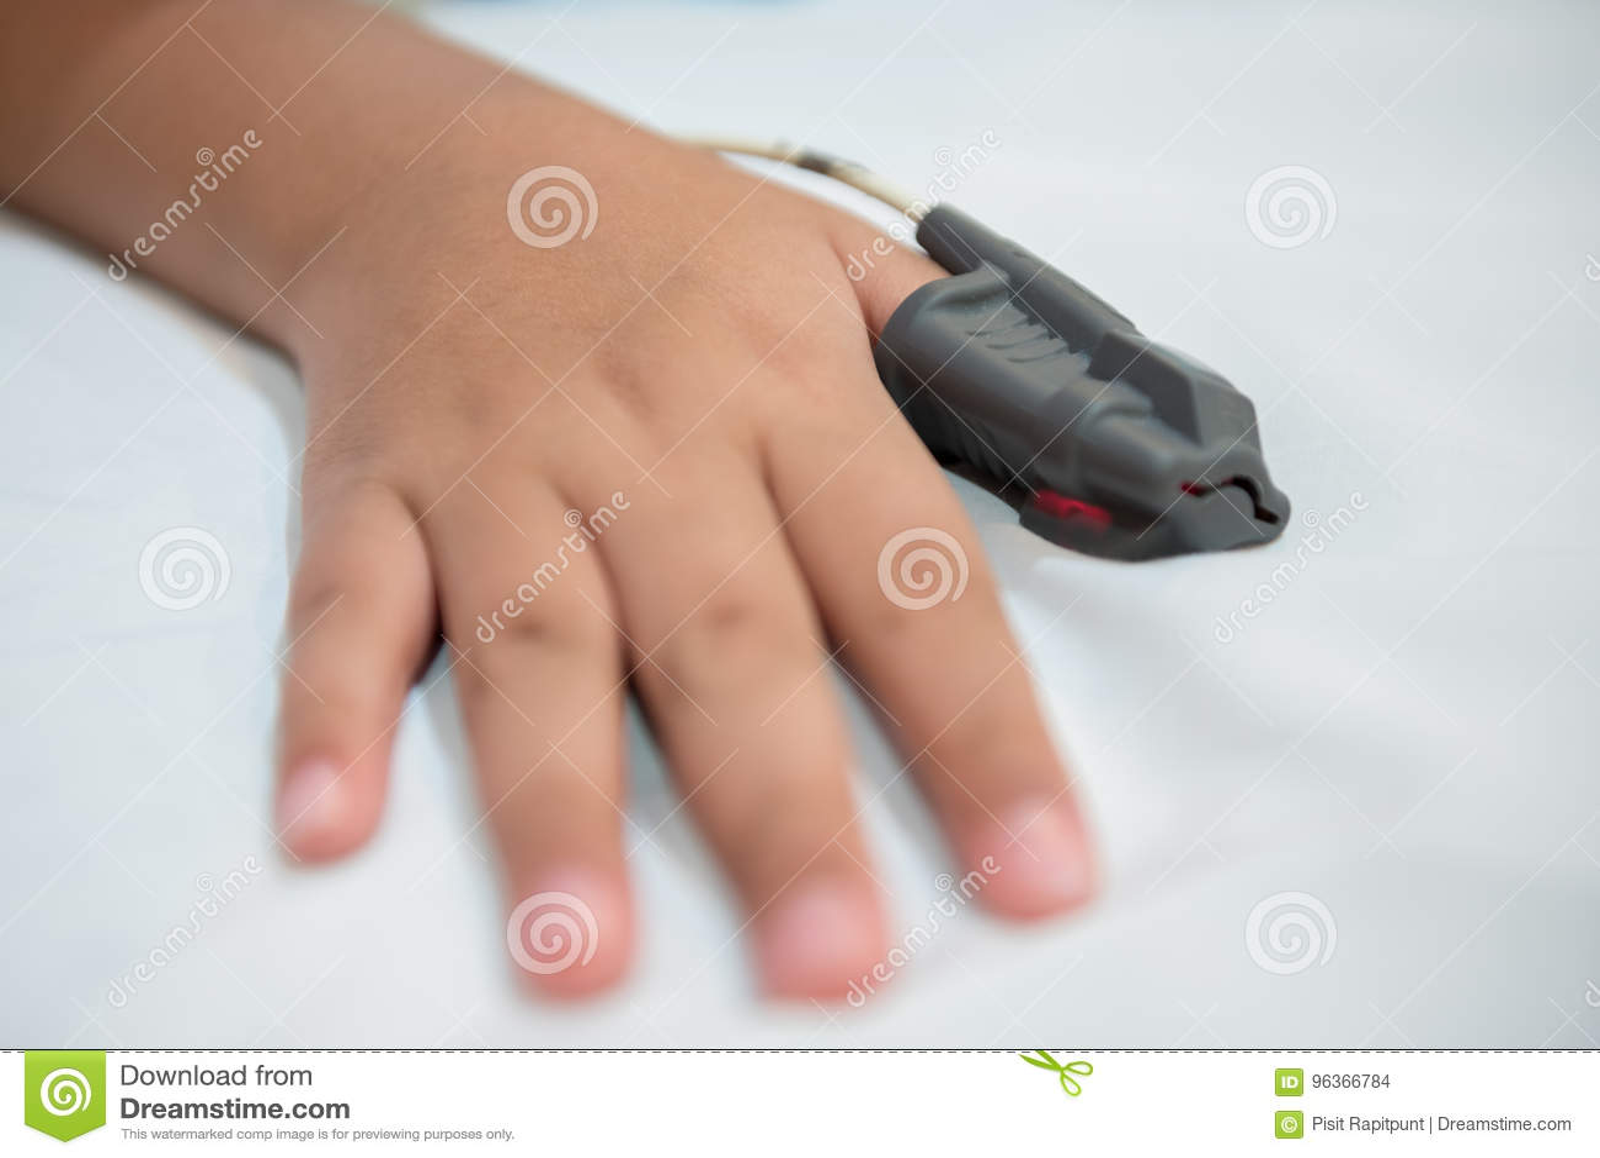 Hand of Asian boy in hospital wearing Sleep Apnea Diagnostic medical device Kit.